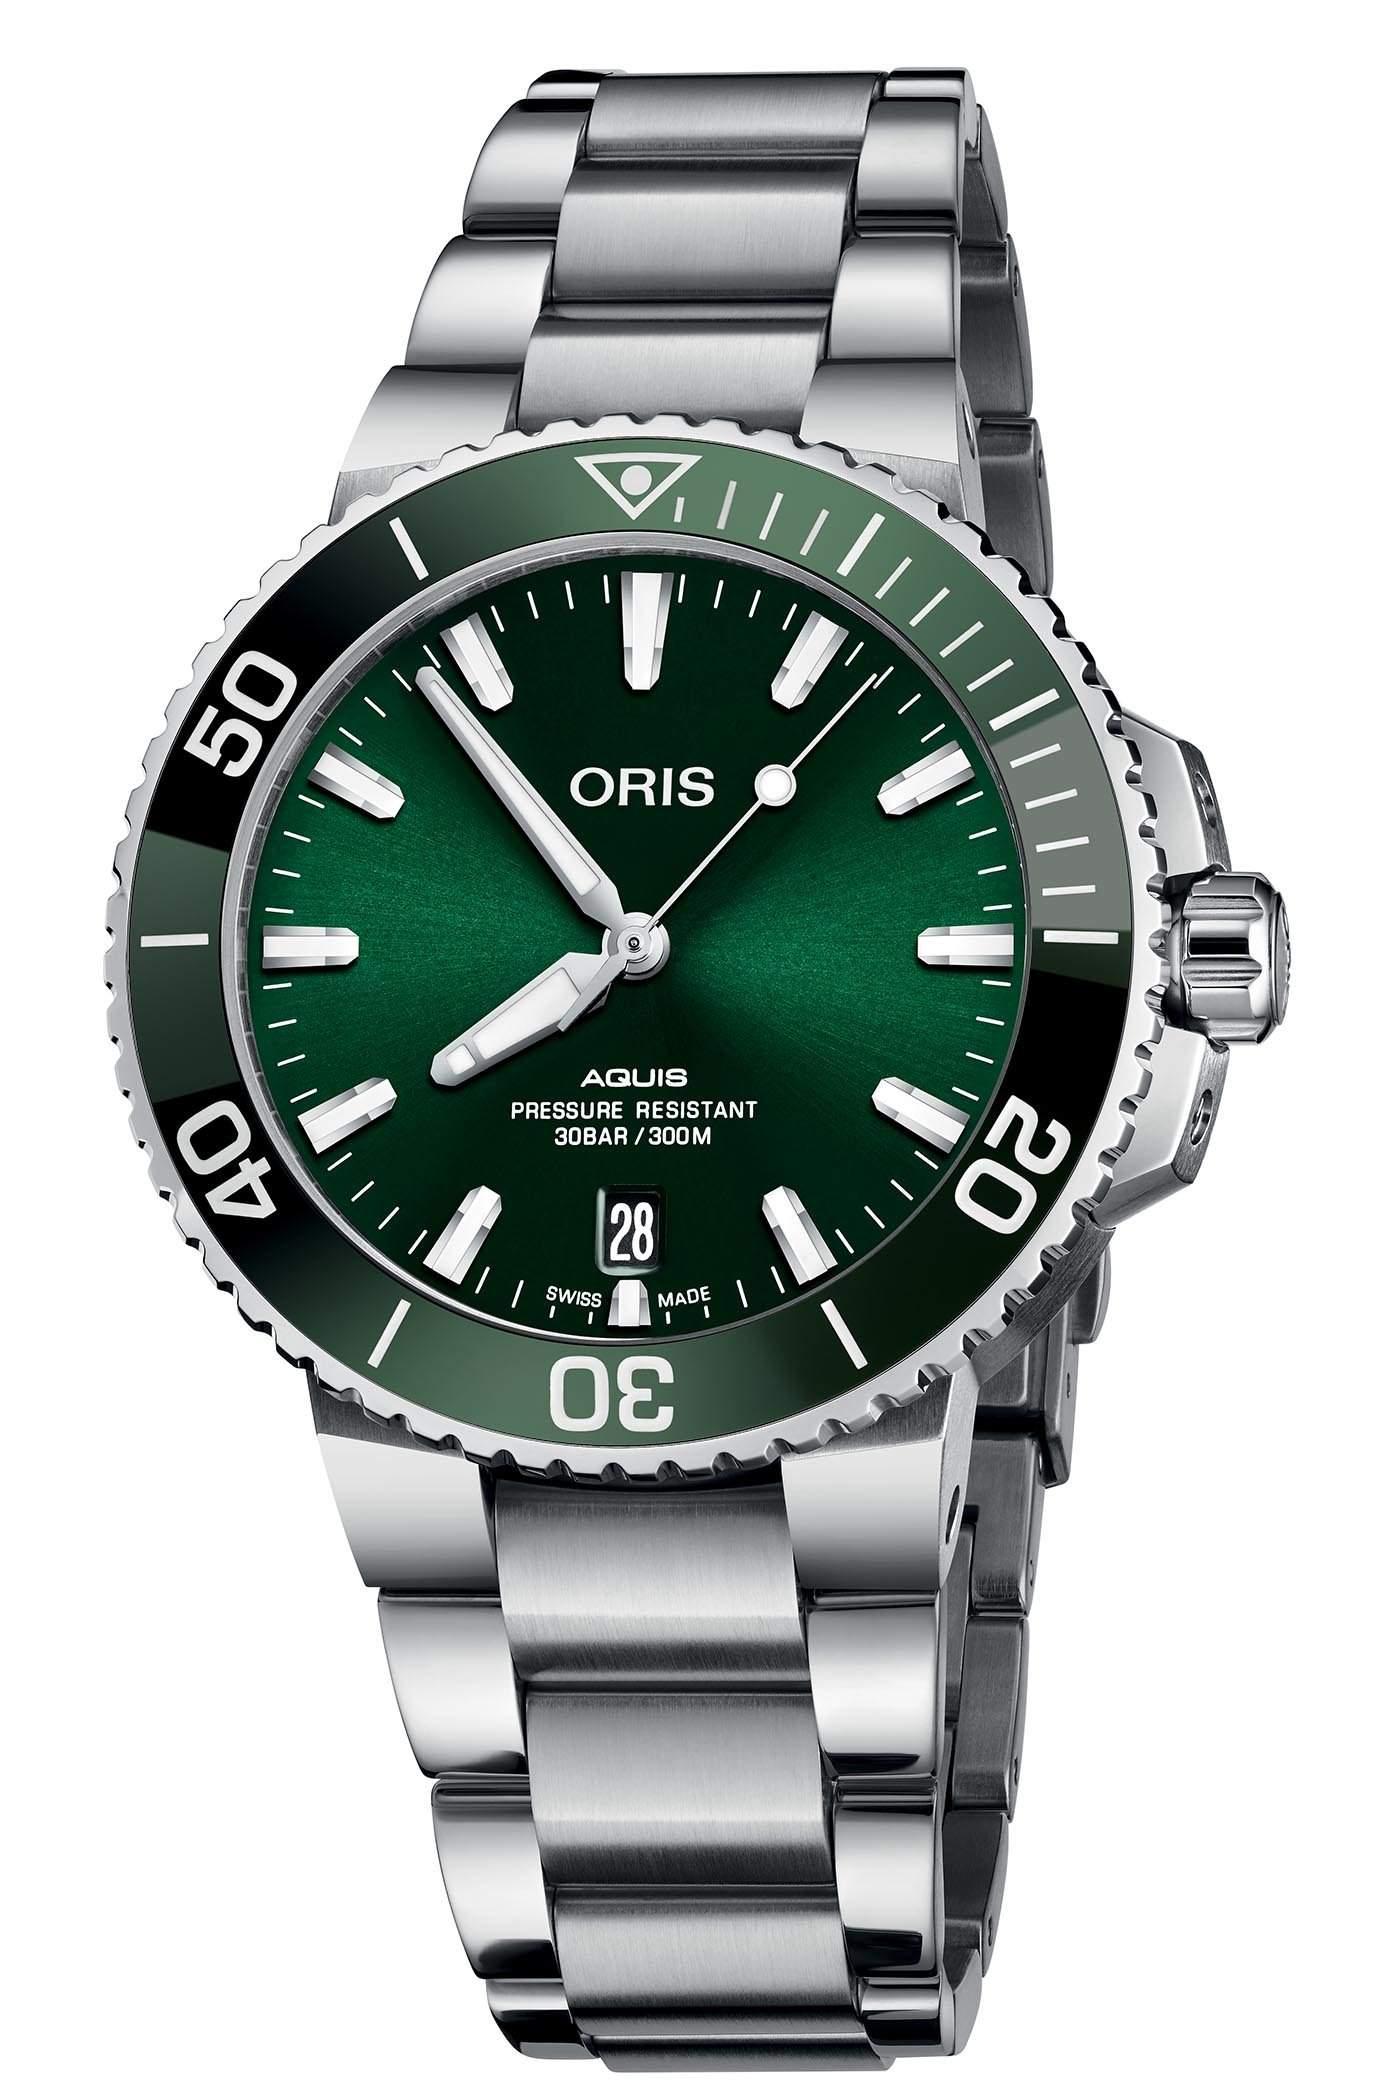 Oris Aquis Date, Image: Oris